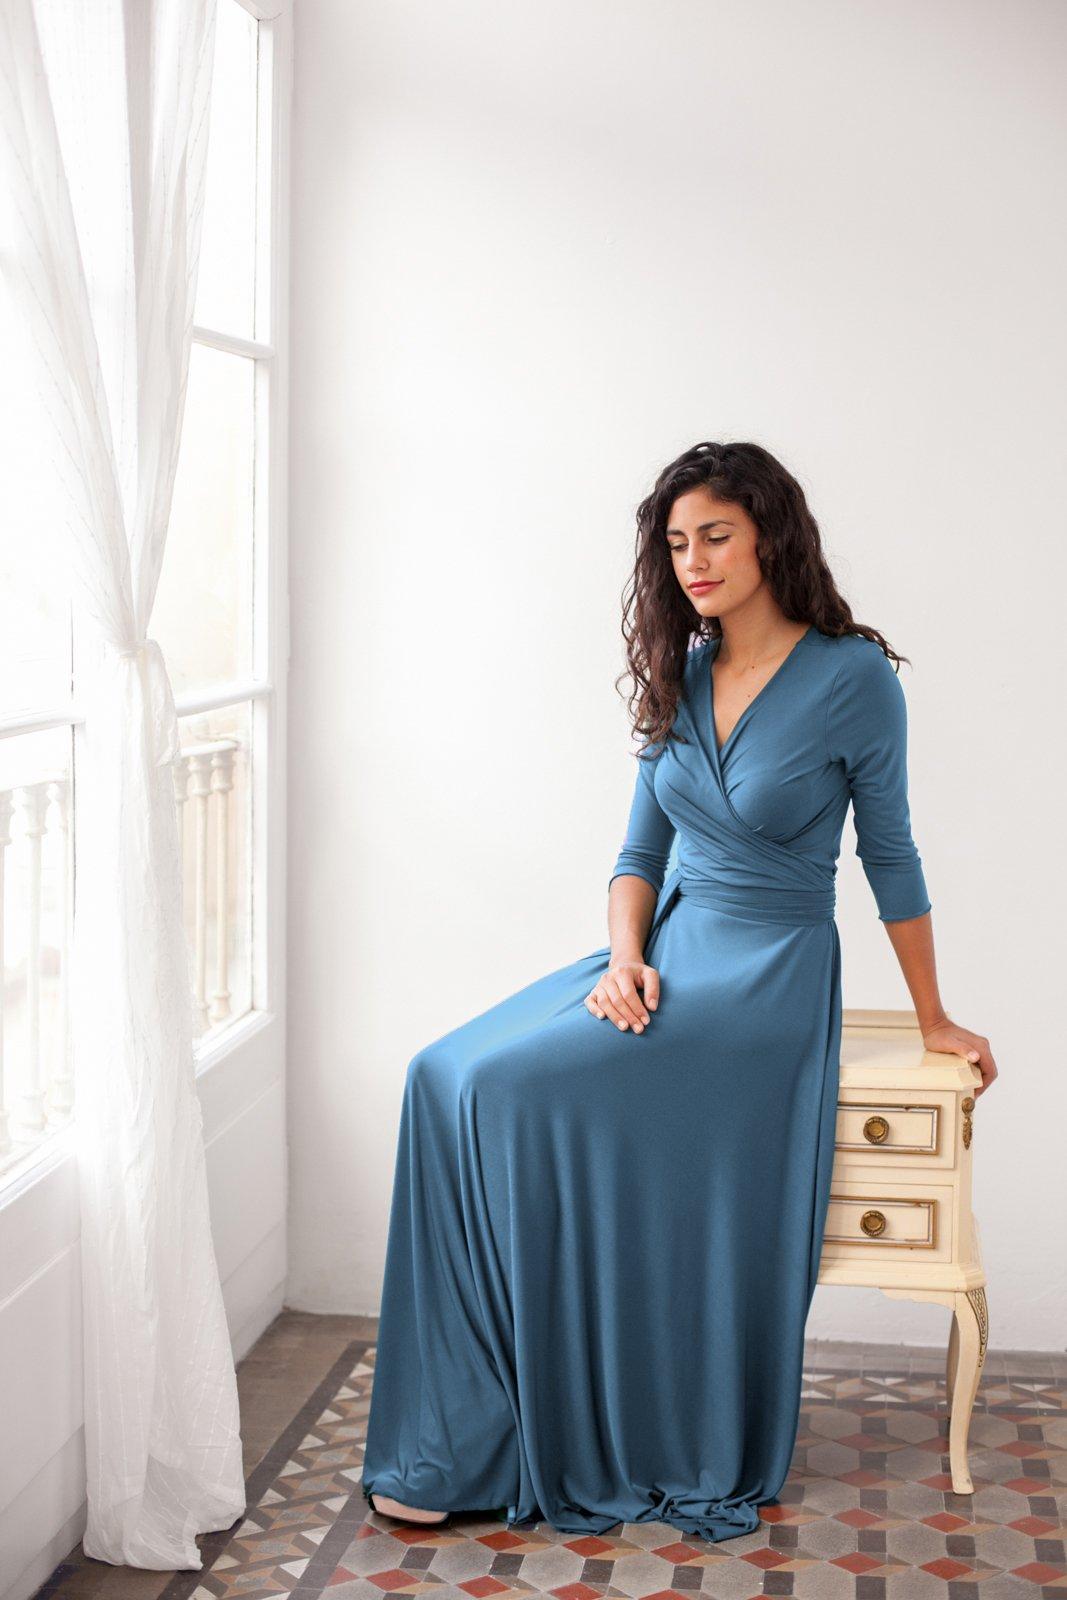 Long sleeve prom dress, evening dress, indigo blue dress with sleeves, long sleeve dress, long sleeve wrap dress, infinity long sleeve dress by Mimètik Bcn